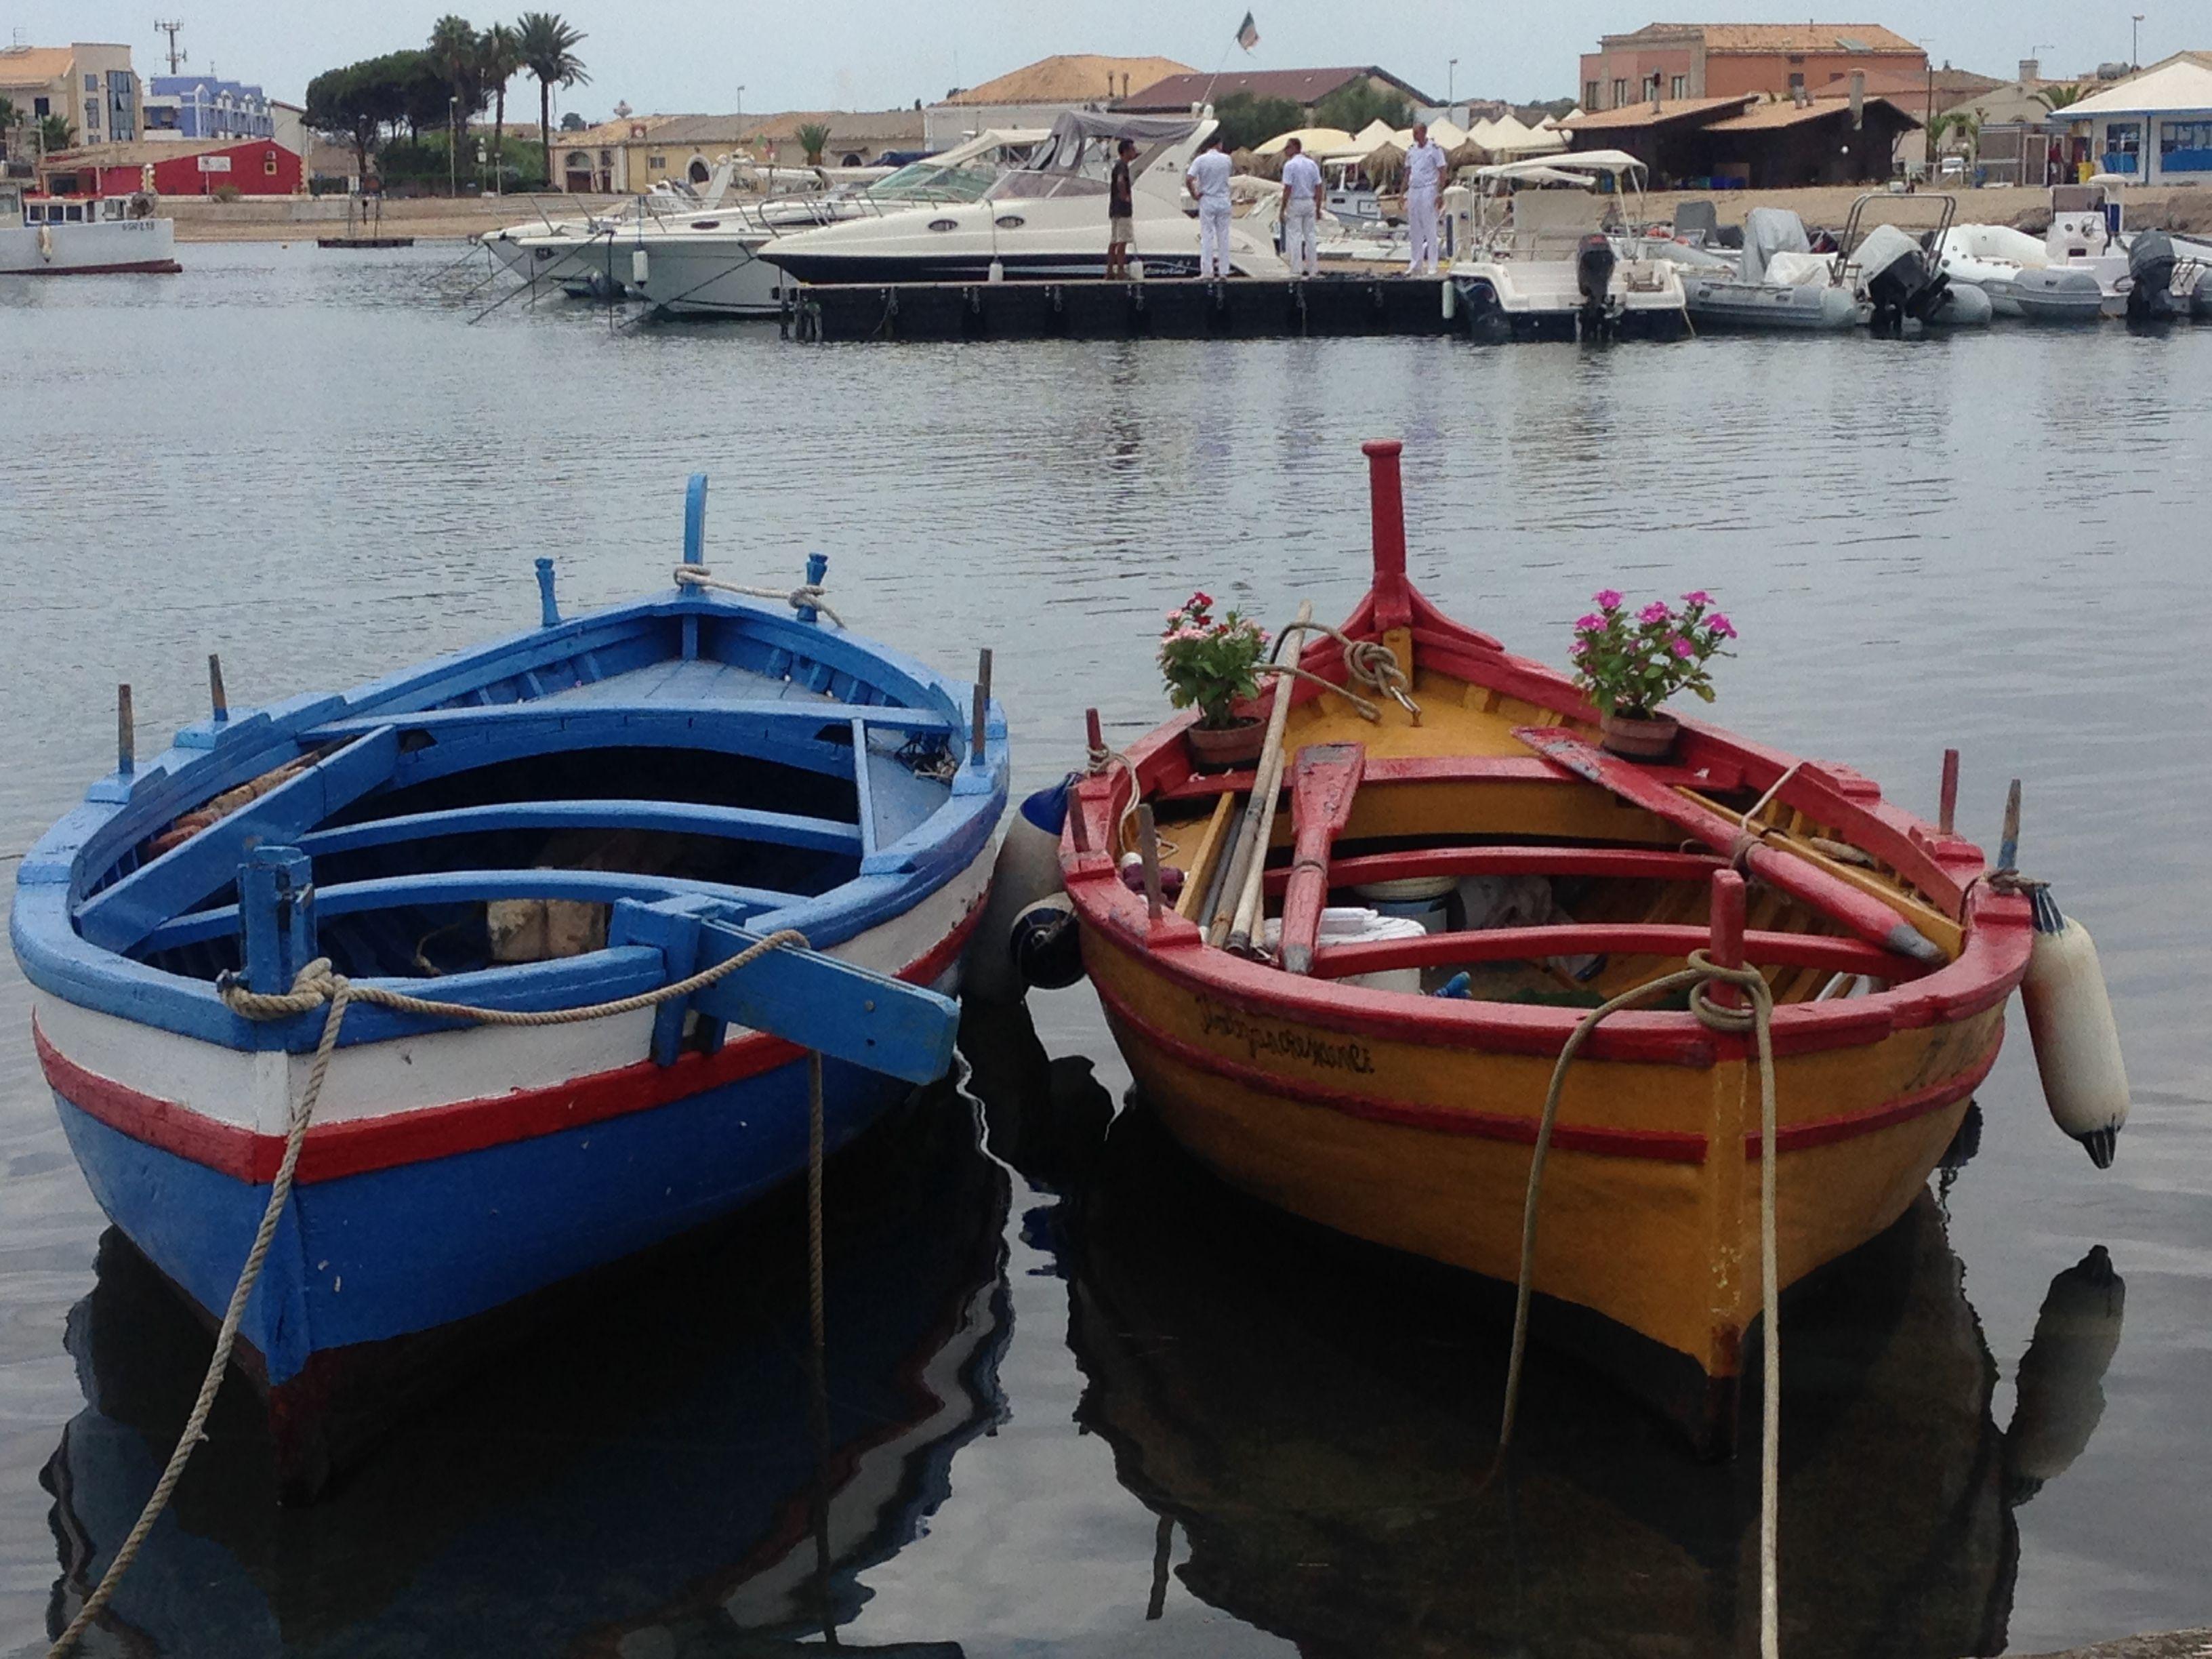 Sicilian Boats | Luzzu | Pinterest | Sicilian, Boating and Sicily